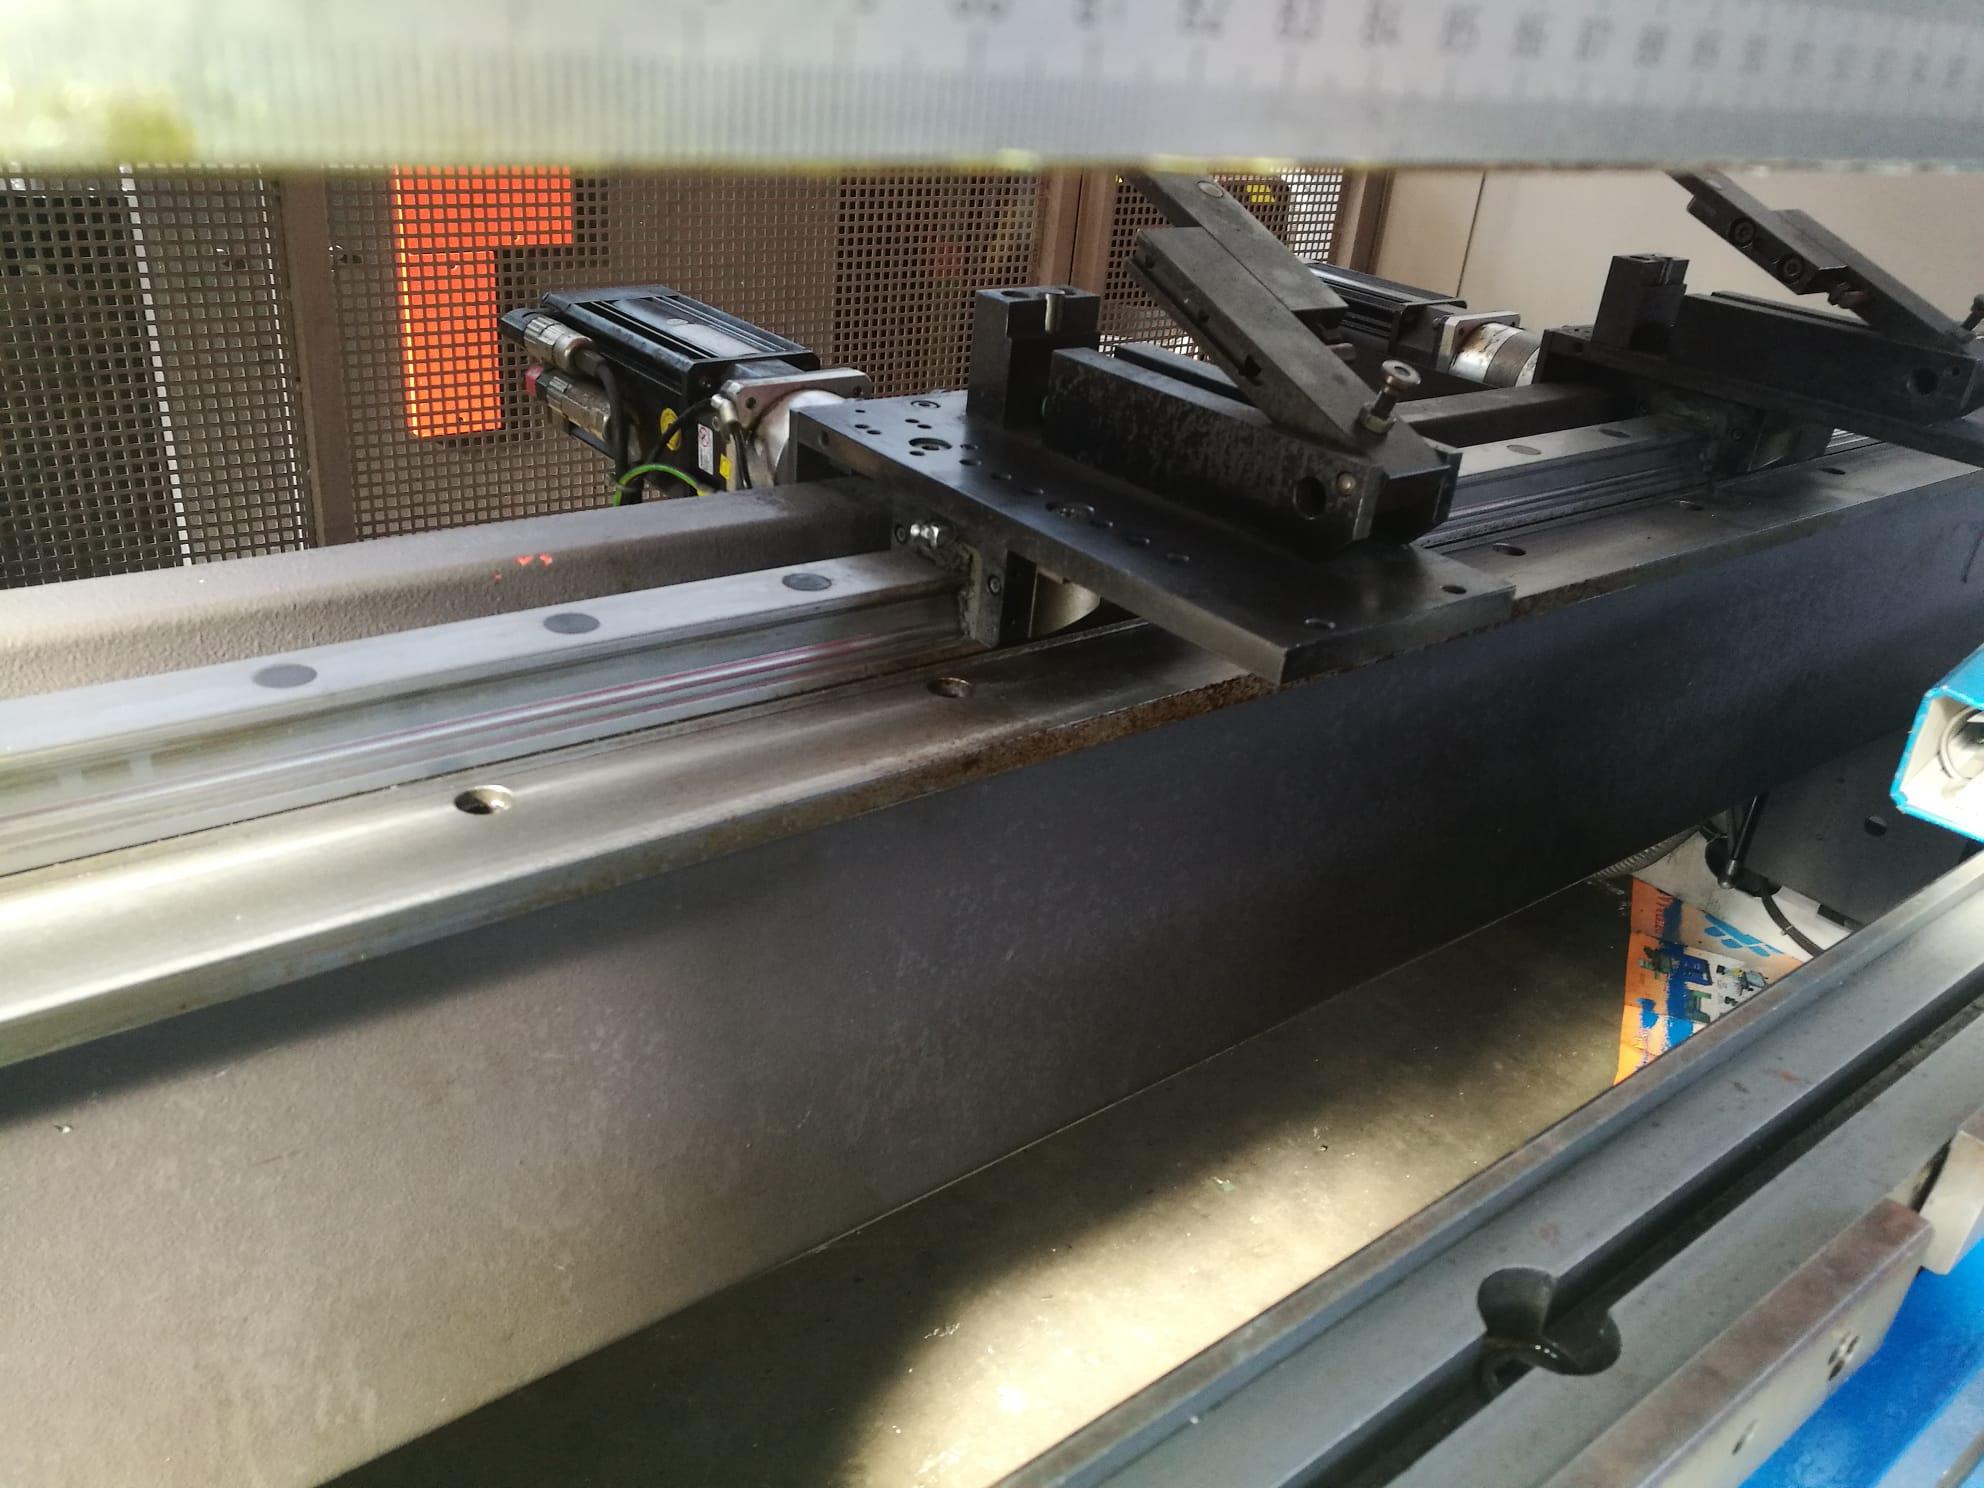 Piegatrice Beyeler pr 6 3100 mm x 100 ton 8 assi in vendita - foto 3